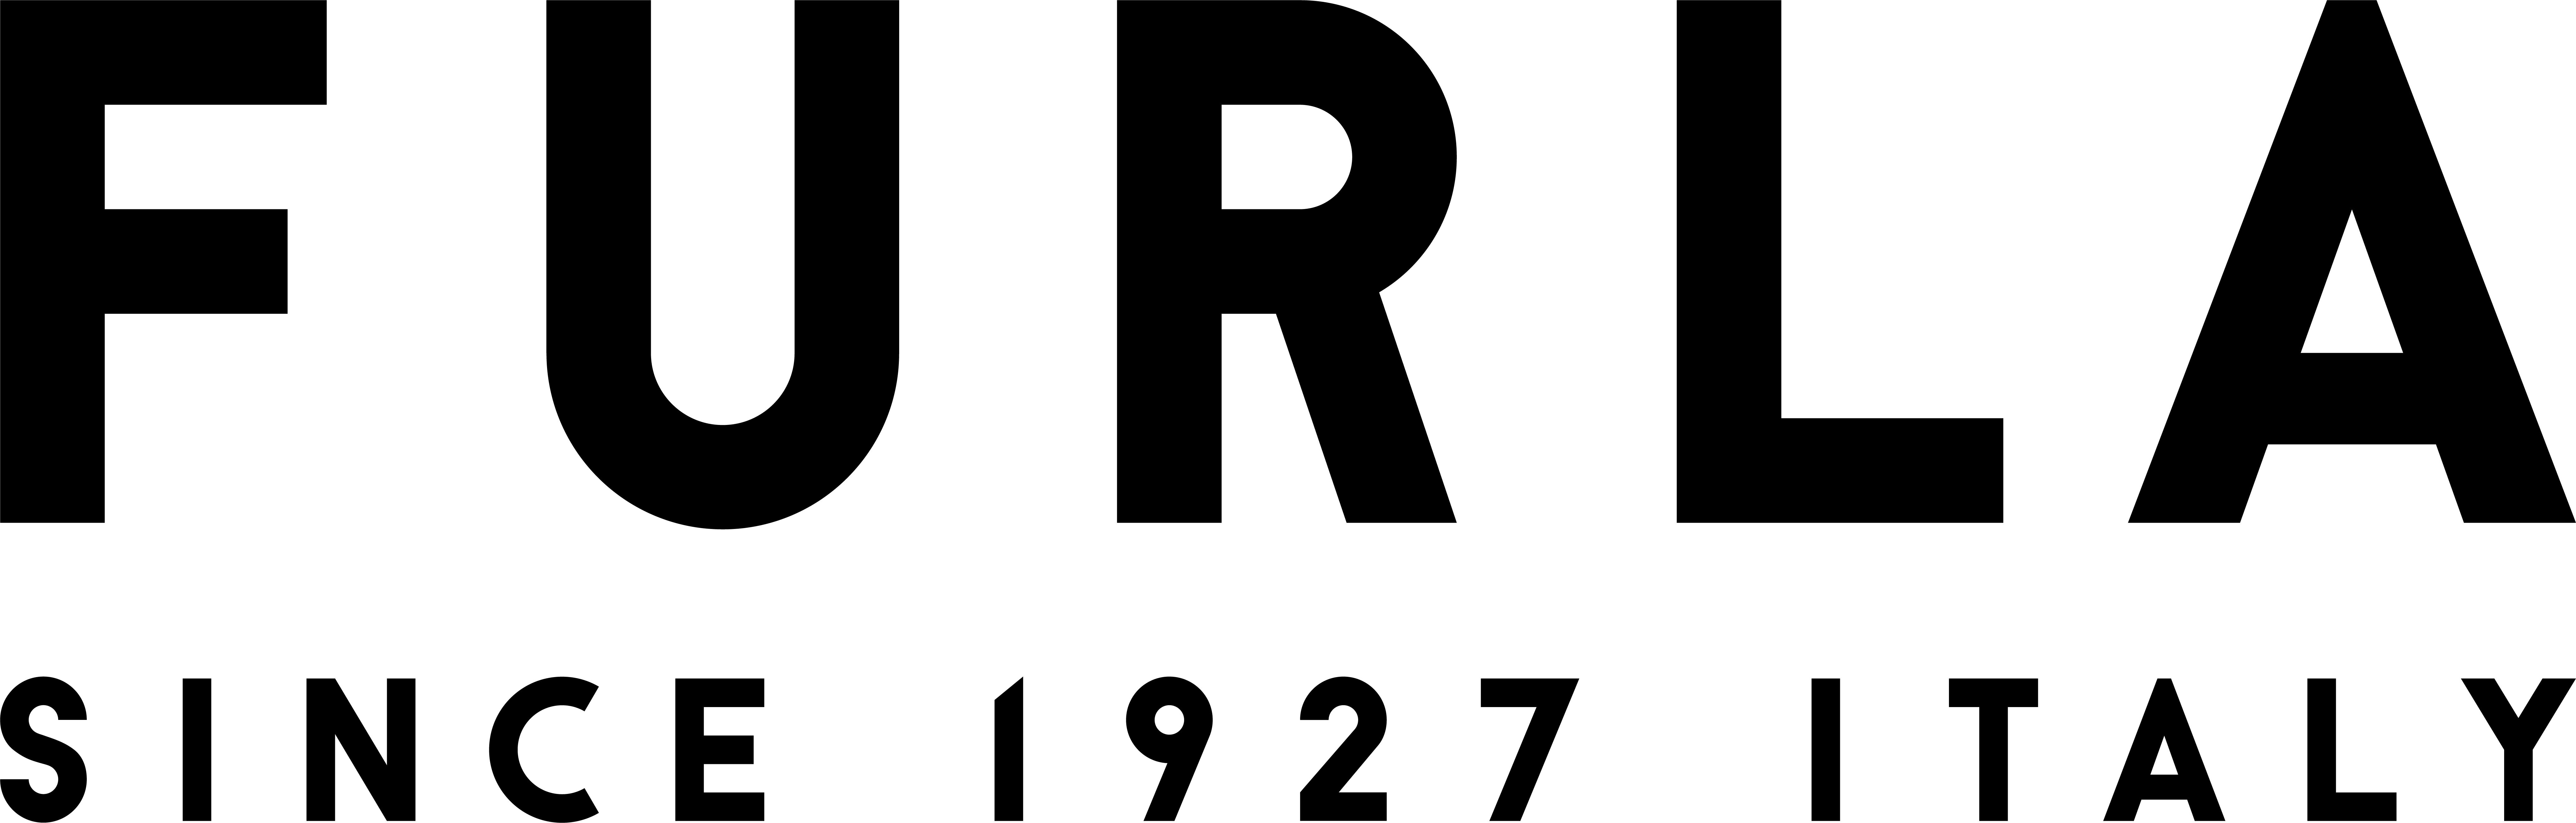 Logo 3tzgn4ionttr31kp